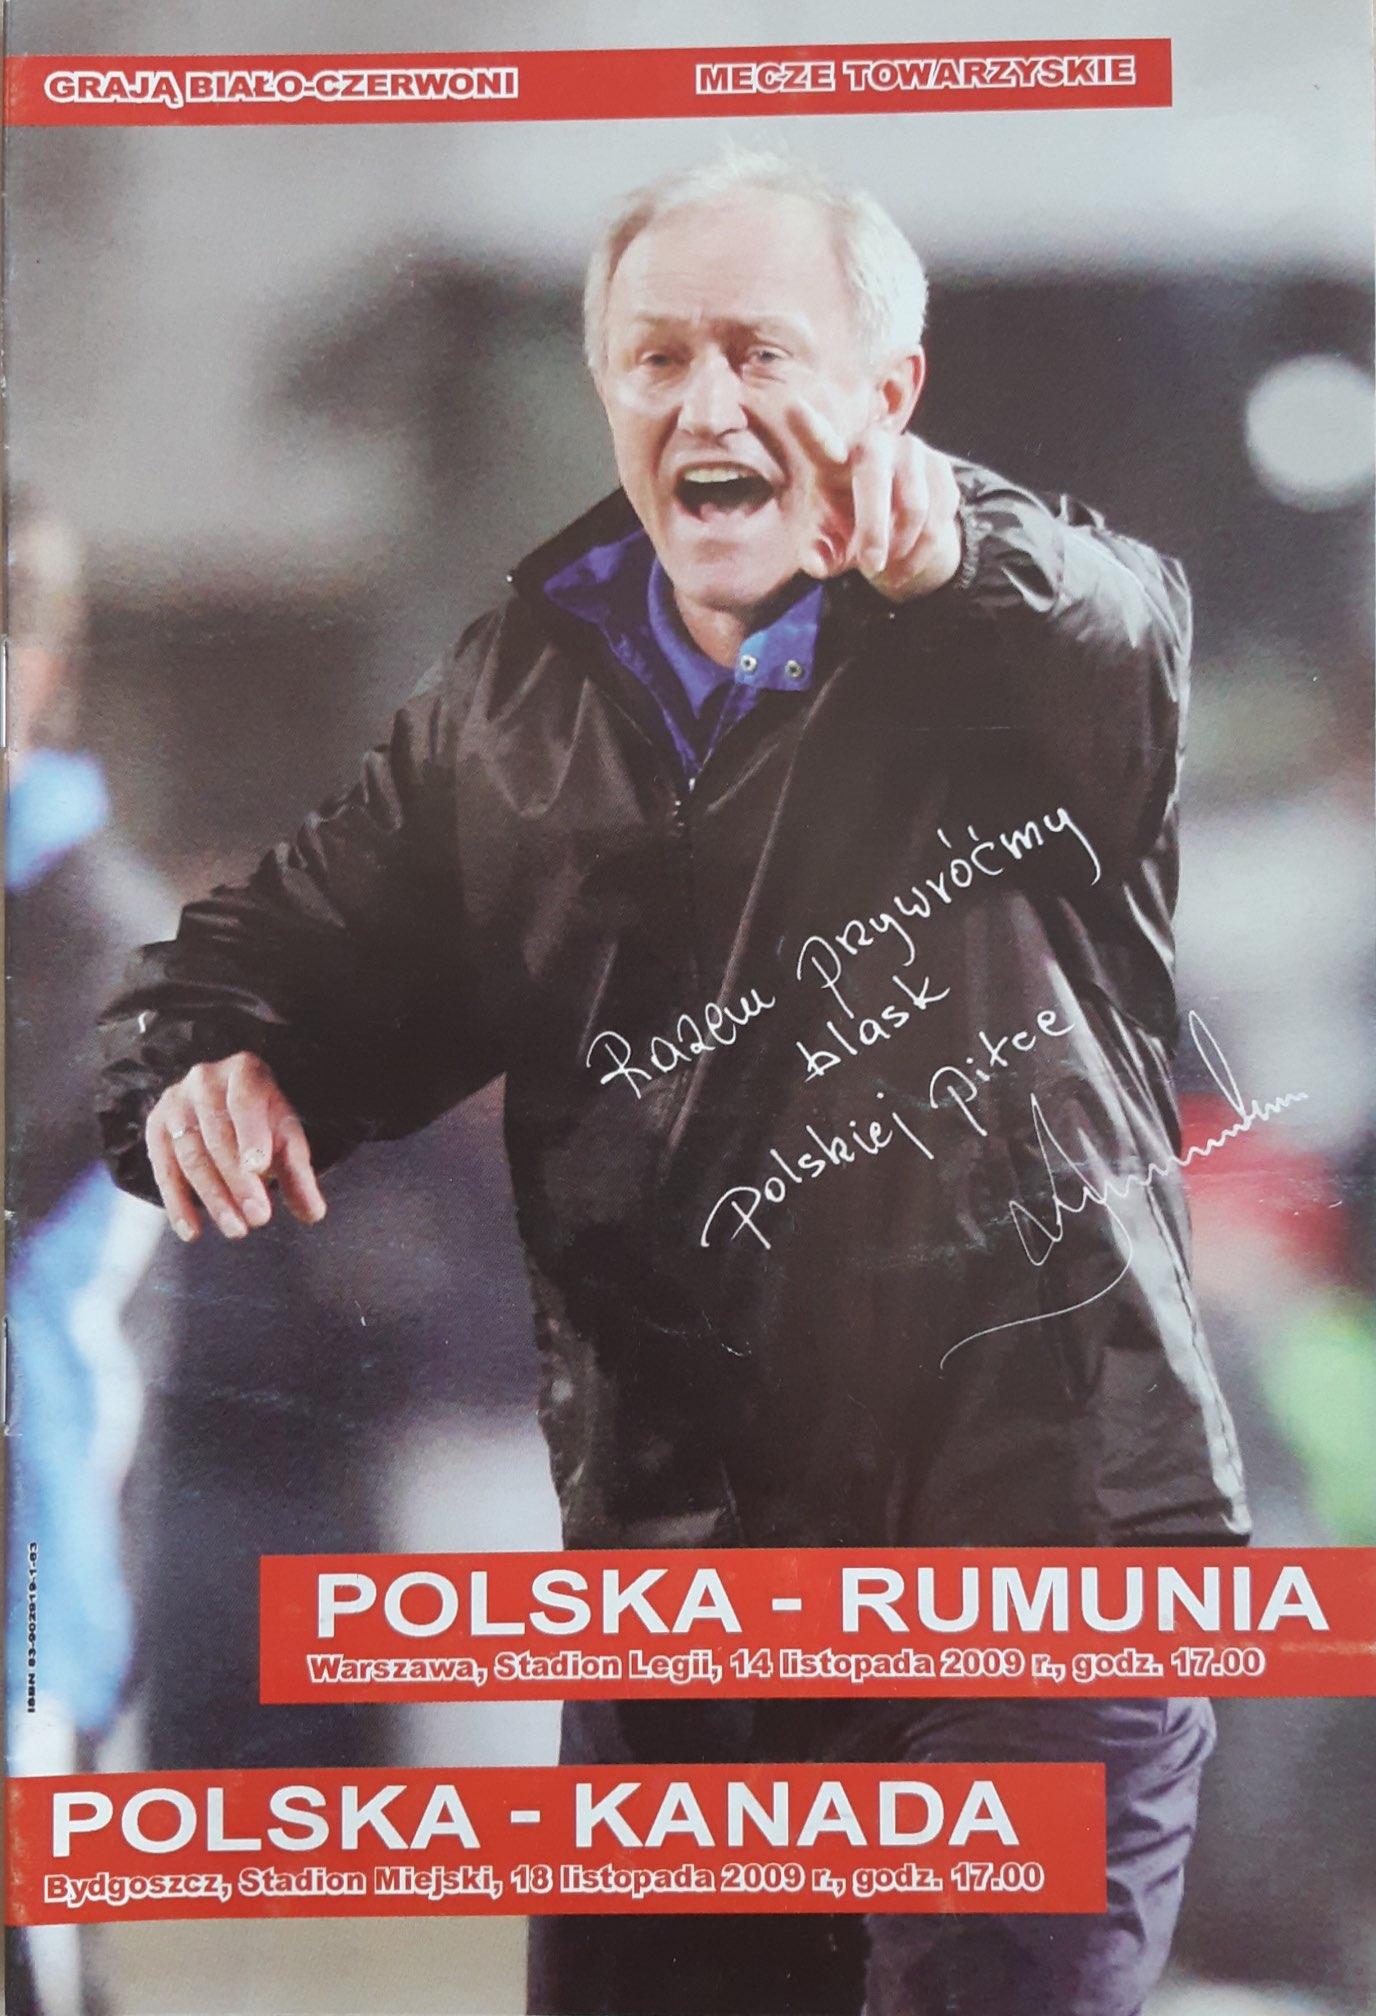 Program meczowy Polska - Rumunia 0:1 (14.11.2009) i Polska - Kanada 1:0 (18.11.2009)